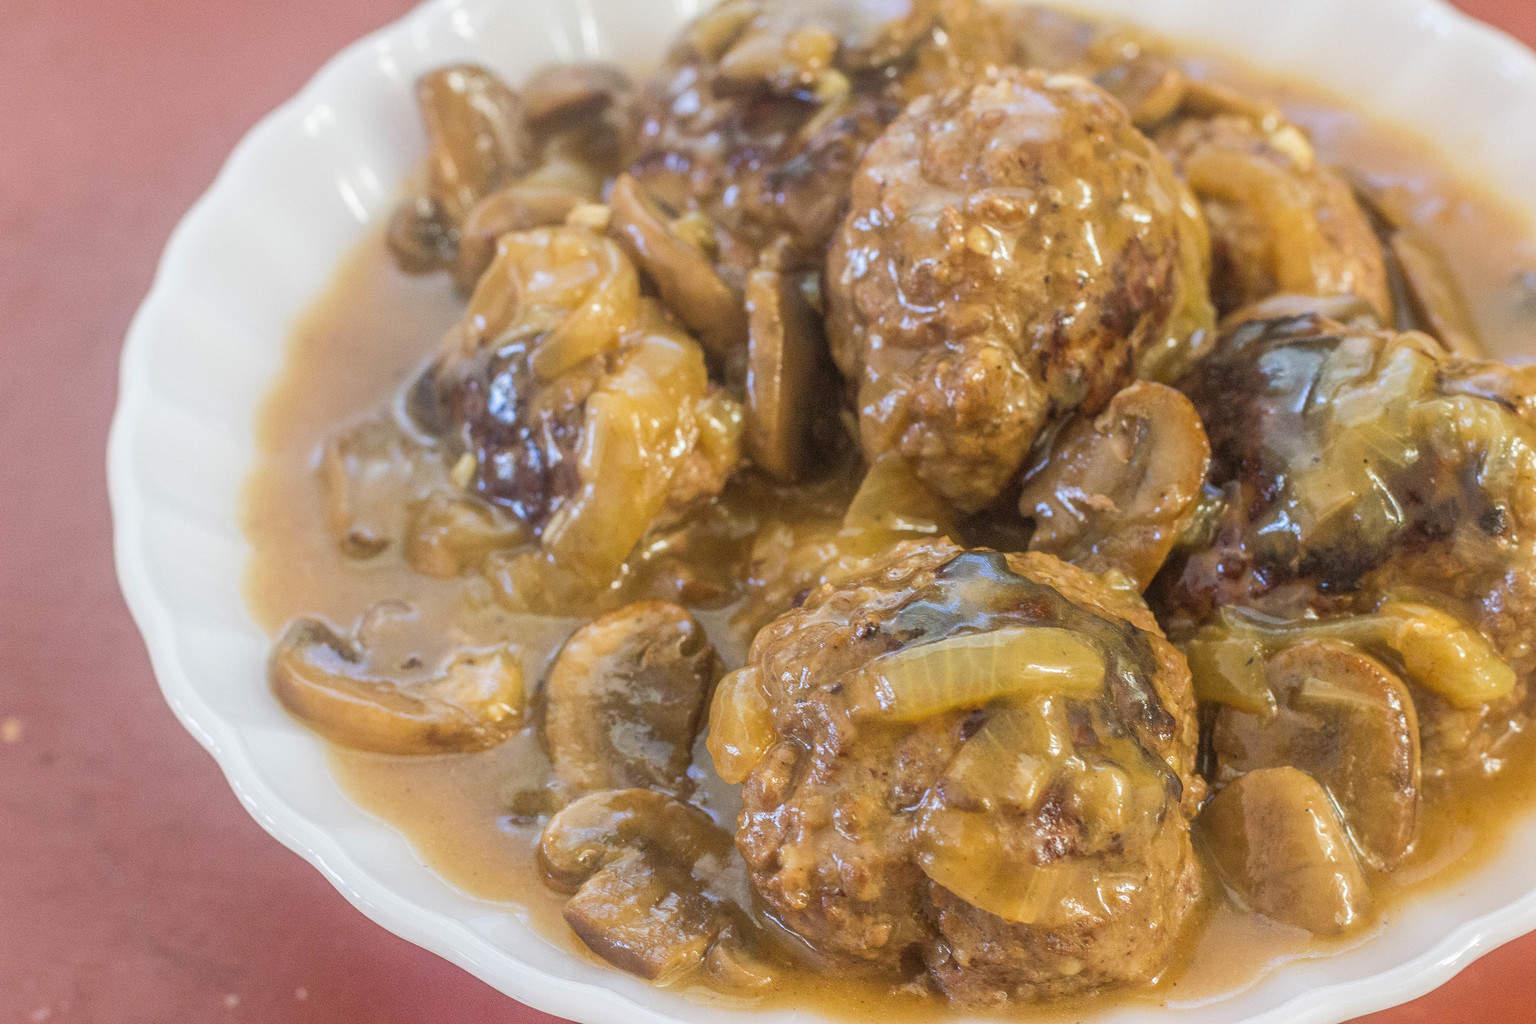 Southern-Style Hamburger Steaks with Onion Mushroom Gravy